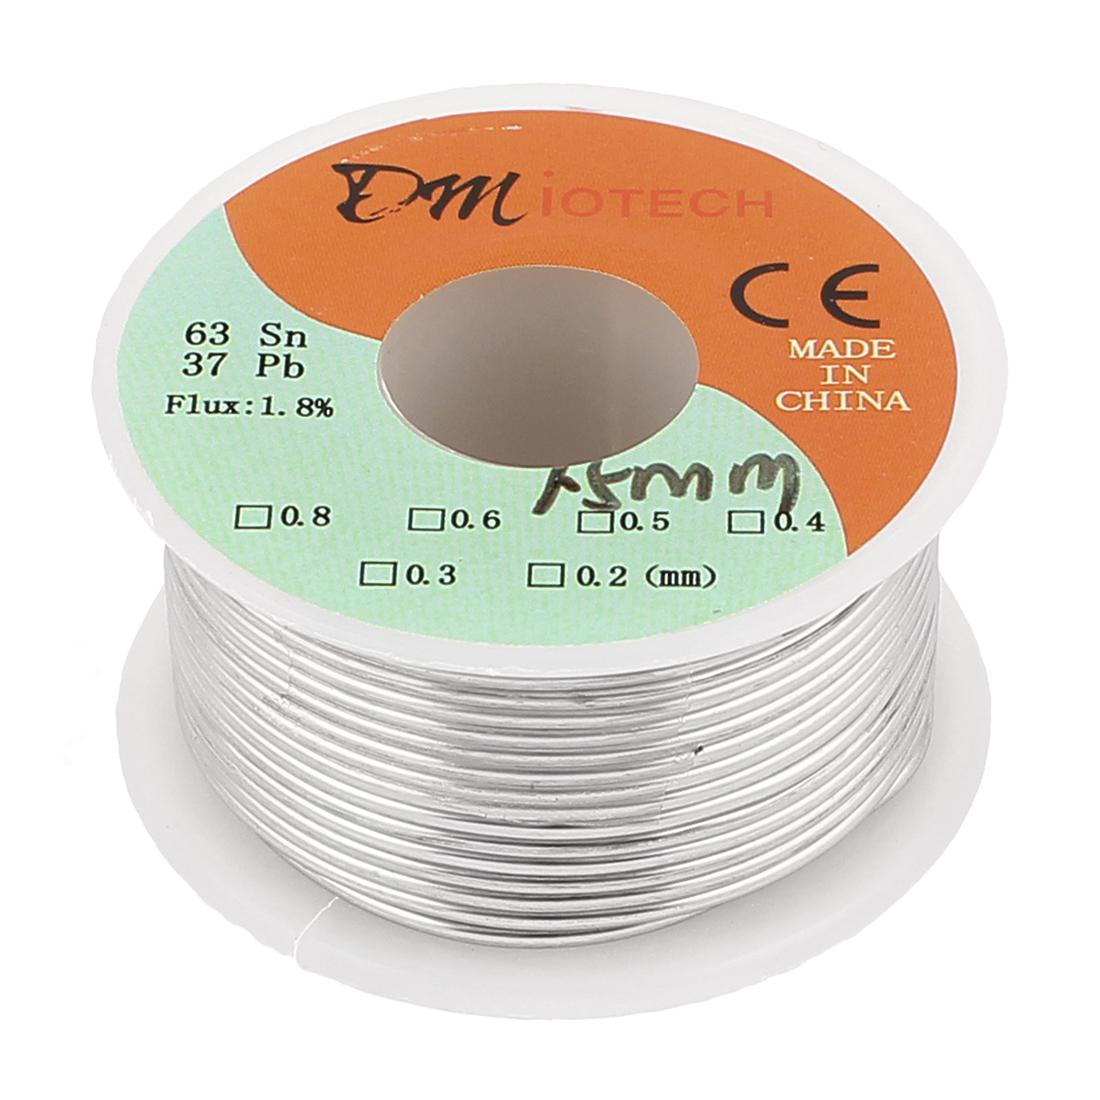 1.5mm 100G 63/37 Rosin Core Flux 1.8% Tin Lead Roll Soldering Wire